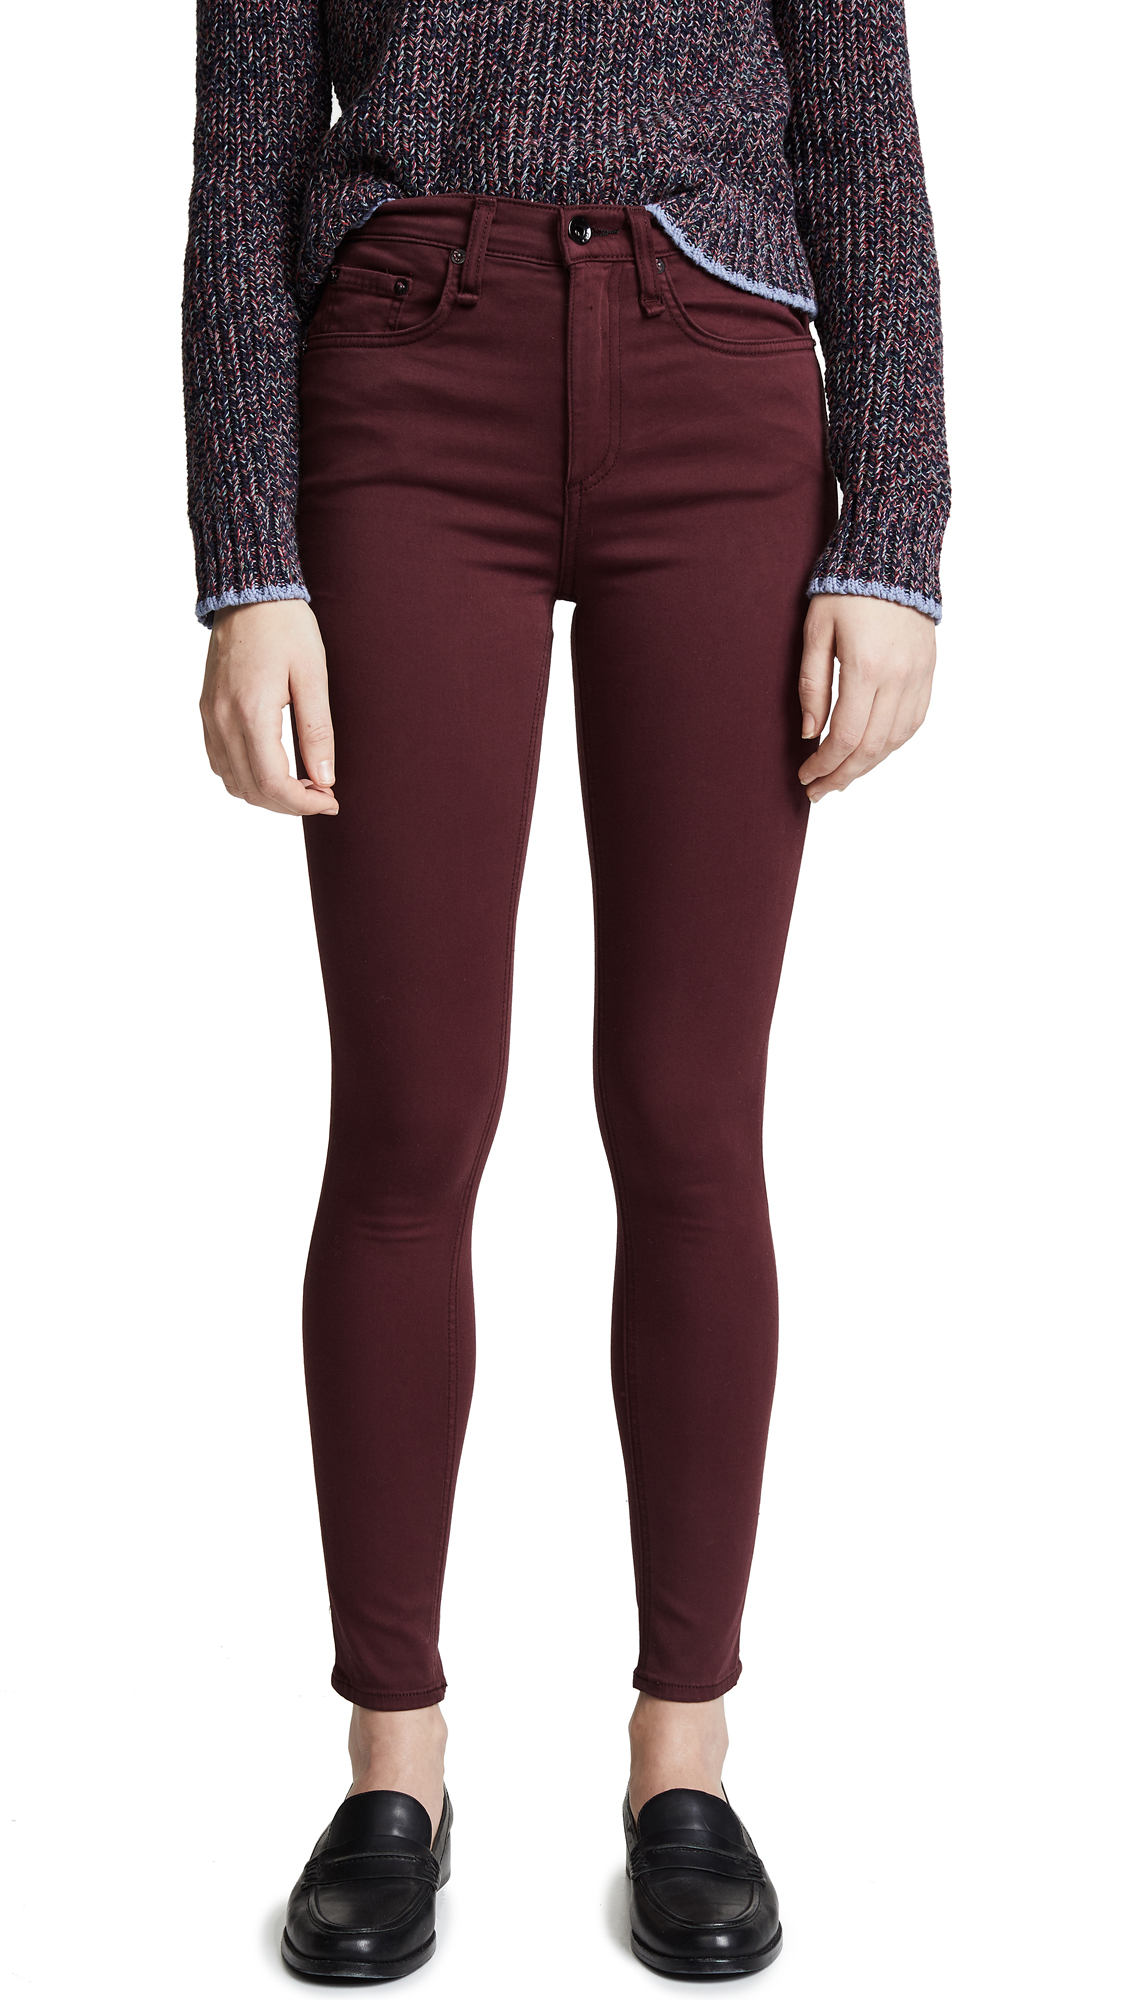 Rag & Bone/JEAN The Plush High Rise Ankle Skinny Jeans